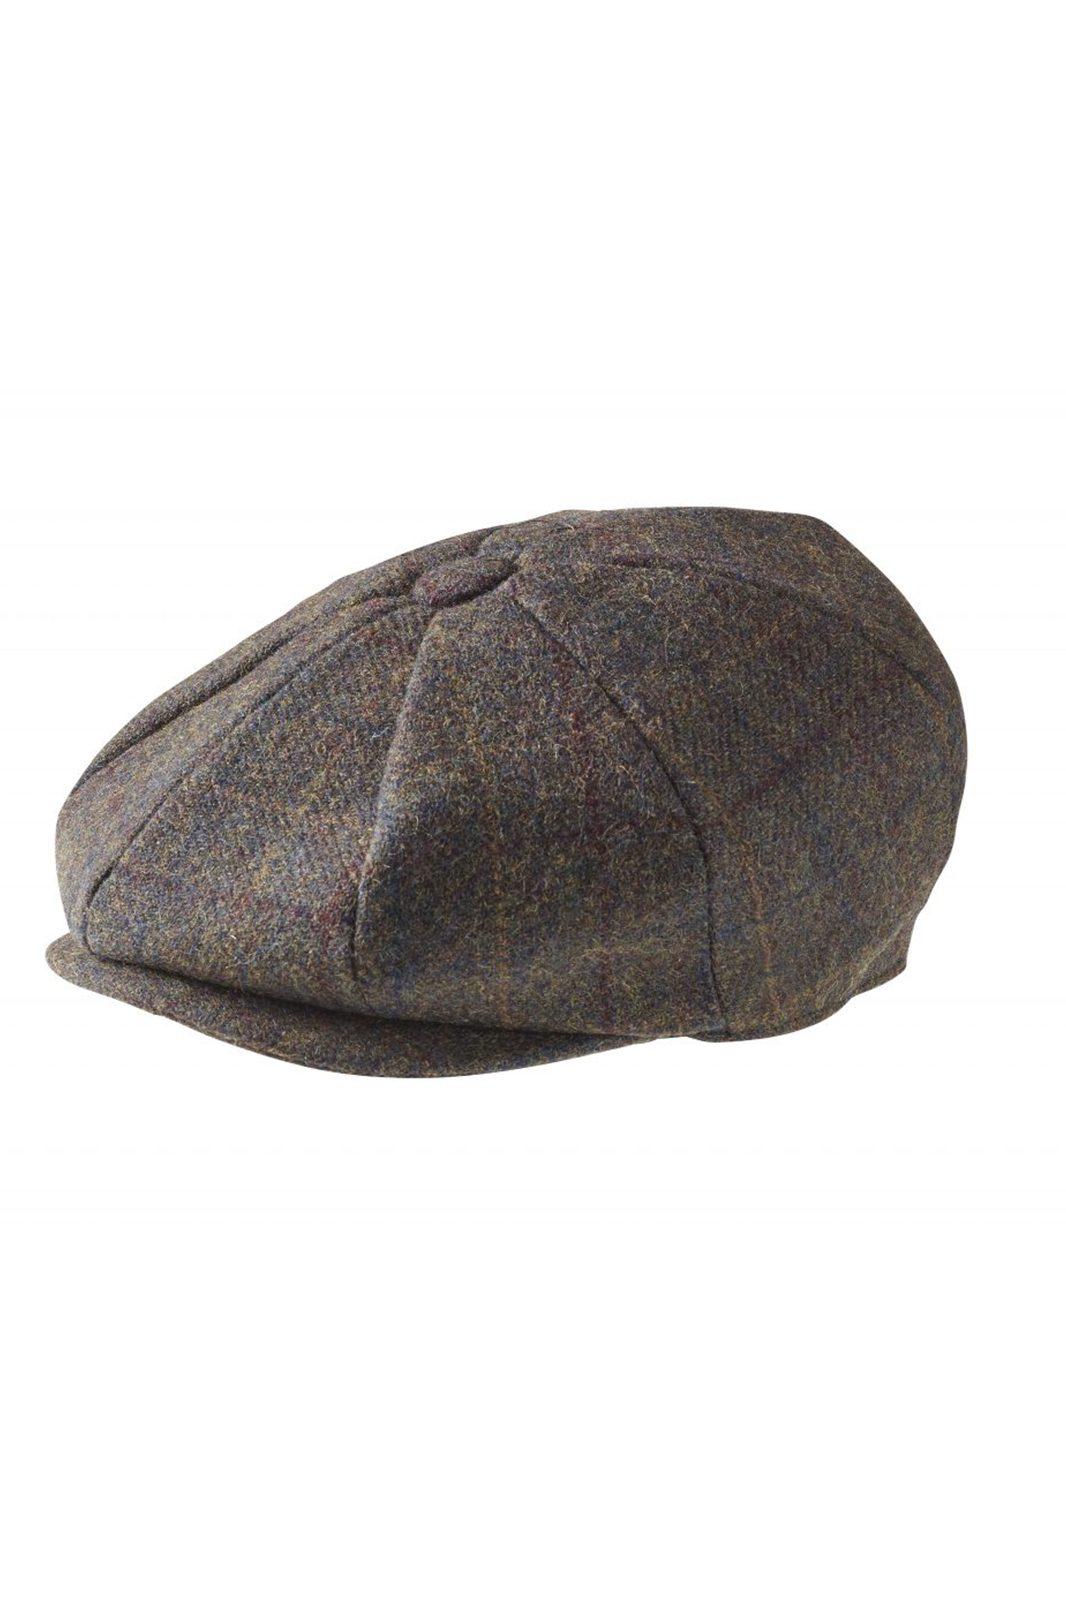 Newsboy Cap Mountain Tweed Brown